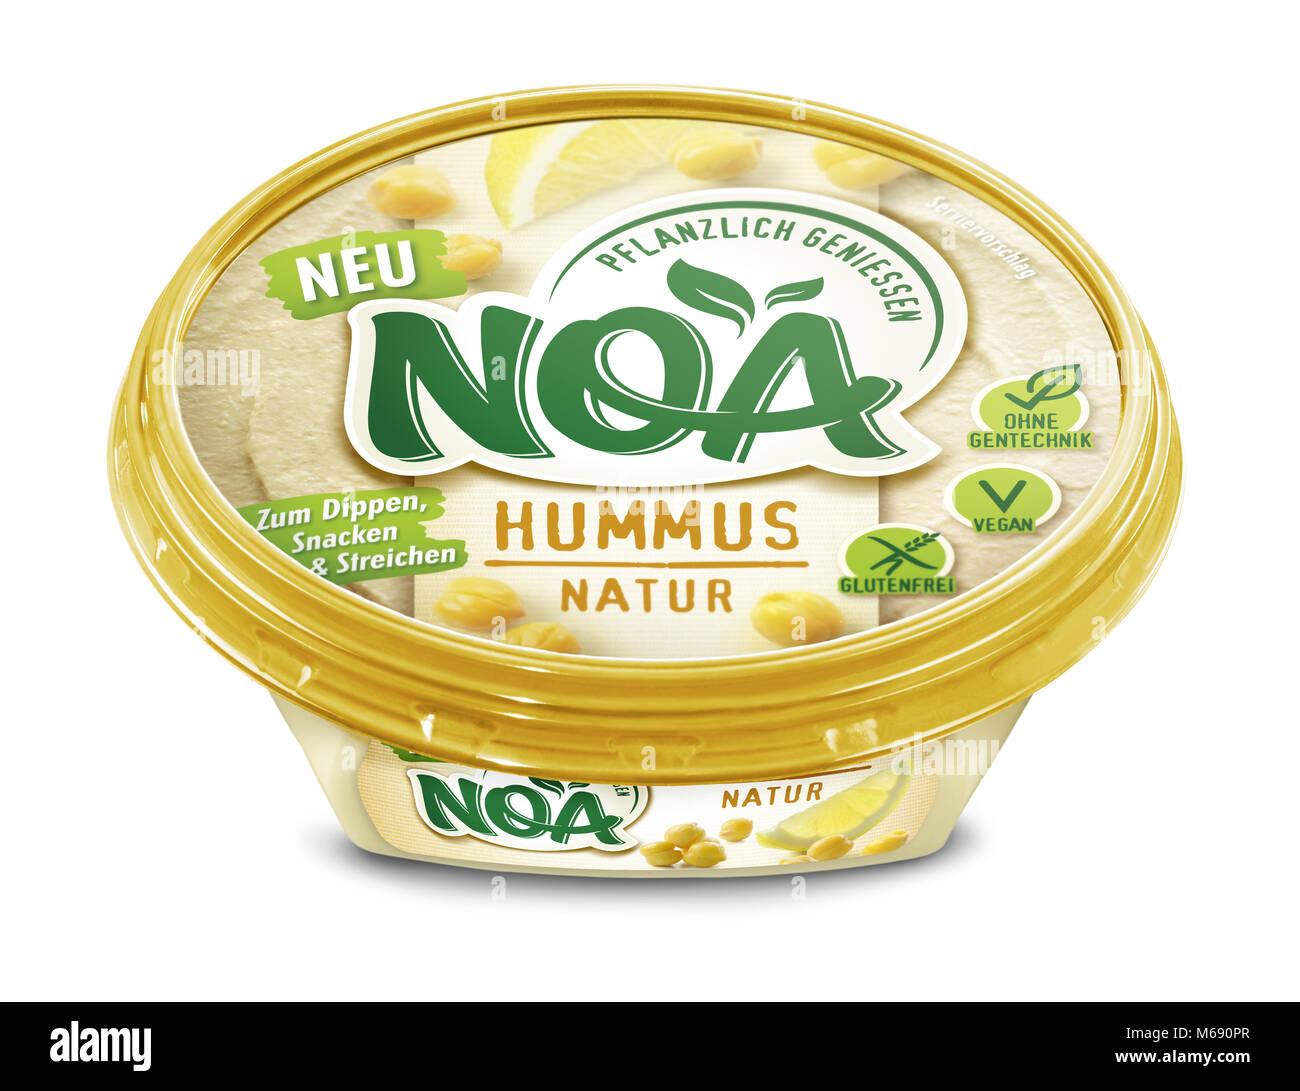 hummus natur - Stock Image